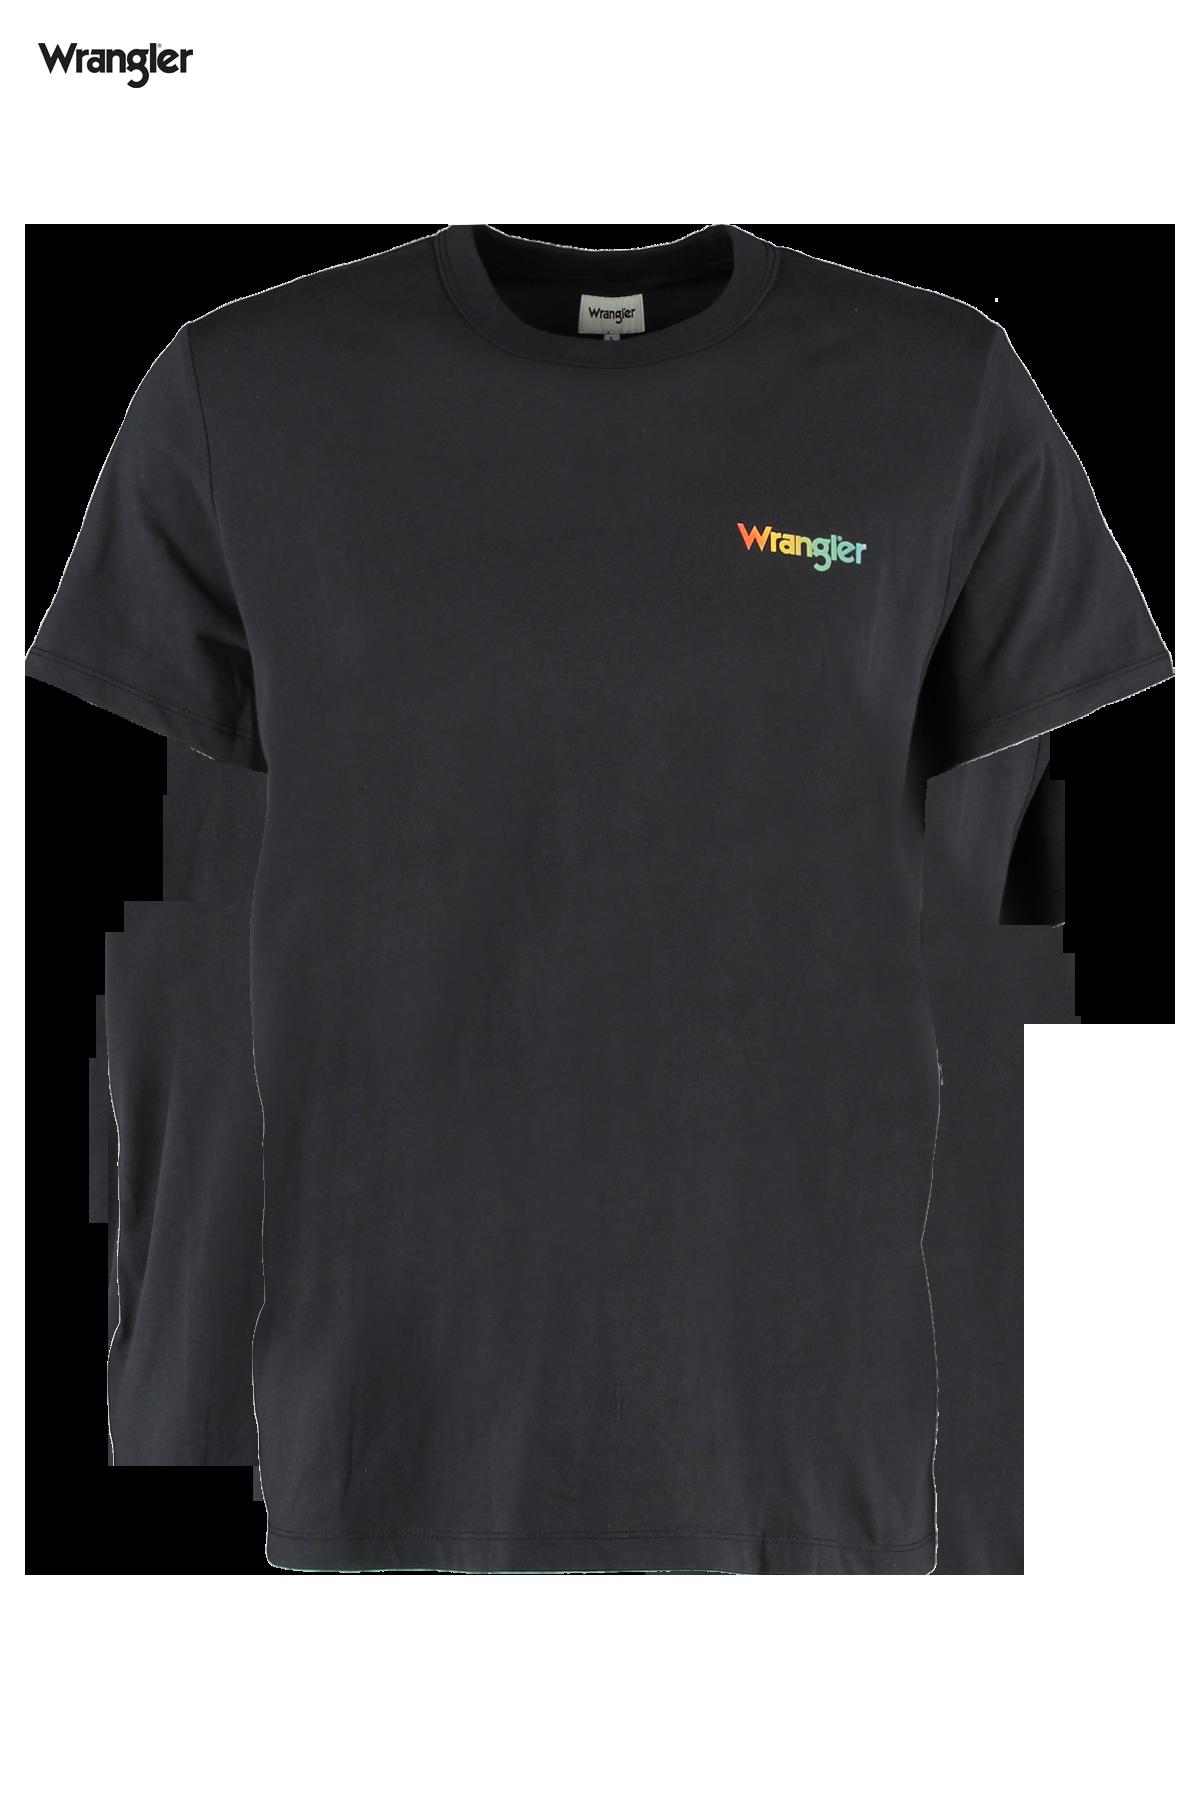 T-shirt Good times tee